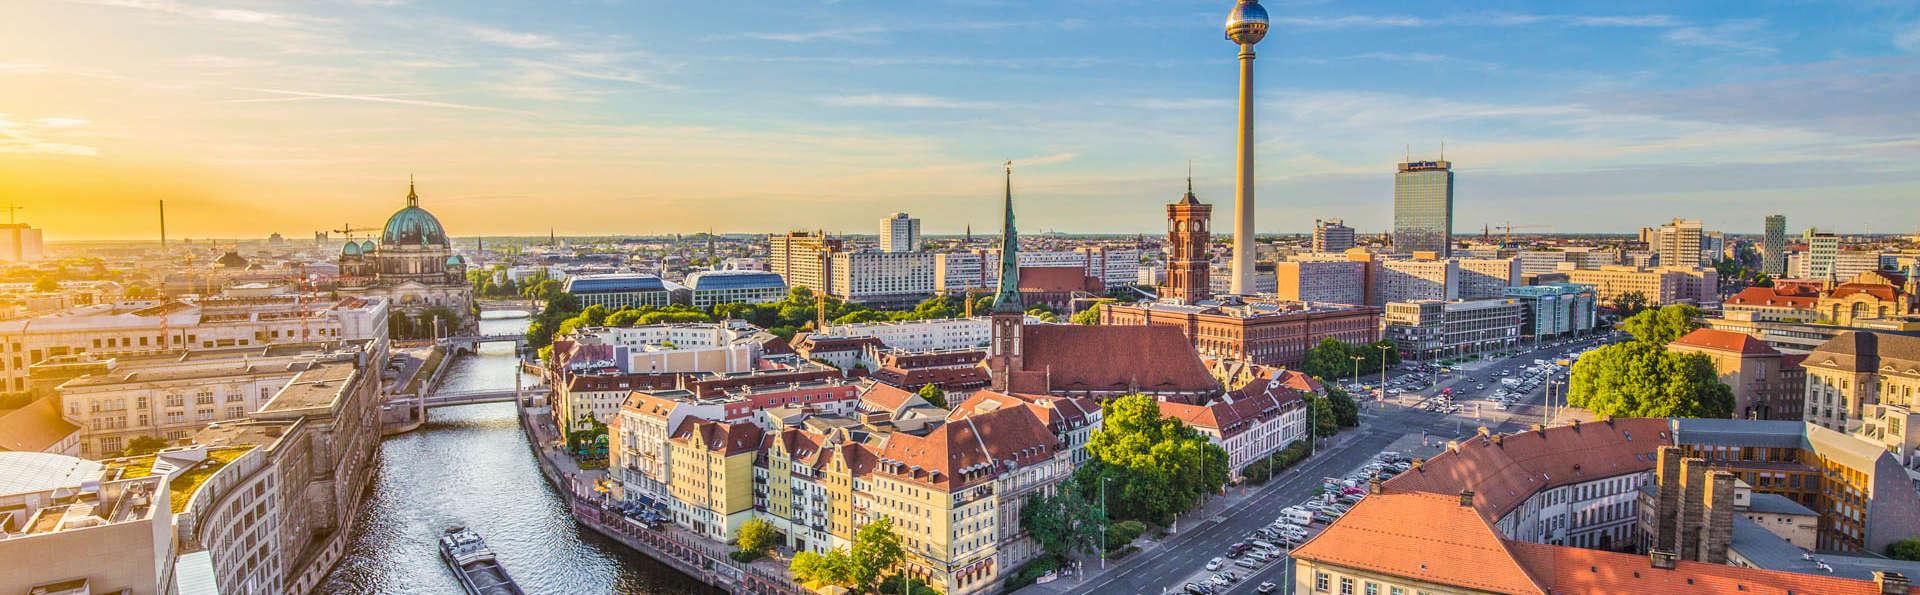 City Hotel Berlin East - EDIT_BERLIN_06.jpg